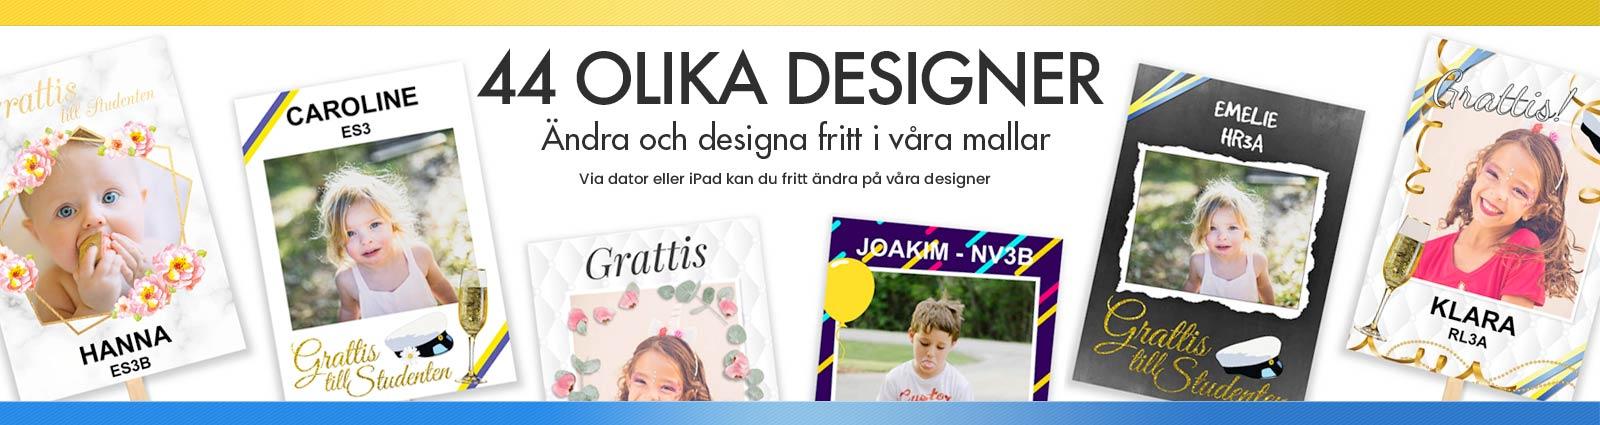 Studentplakat 44 olika designer